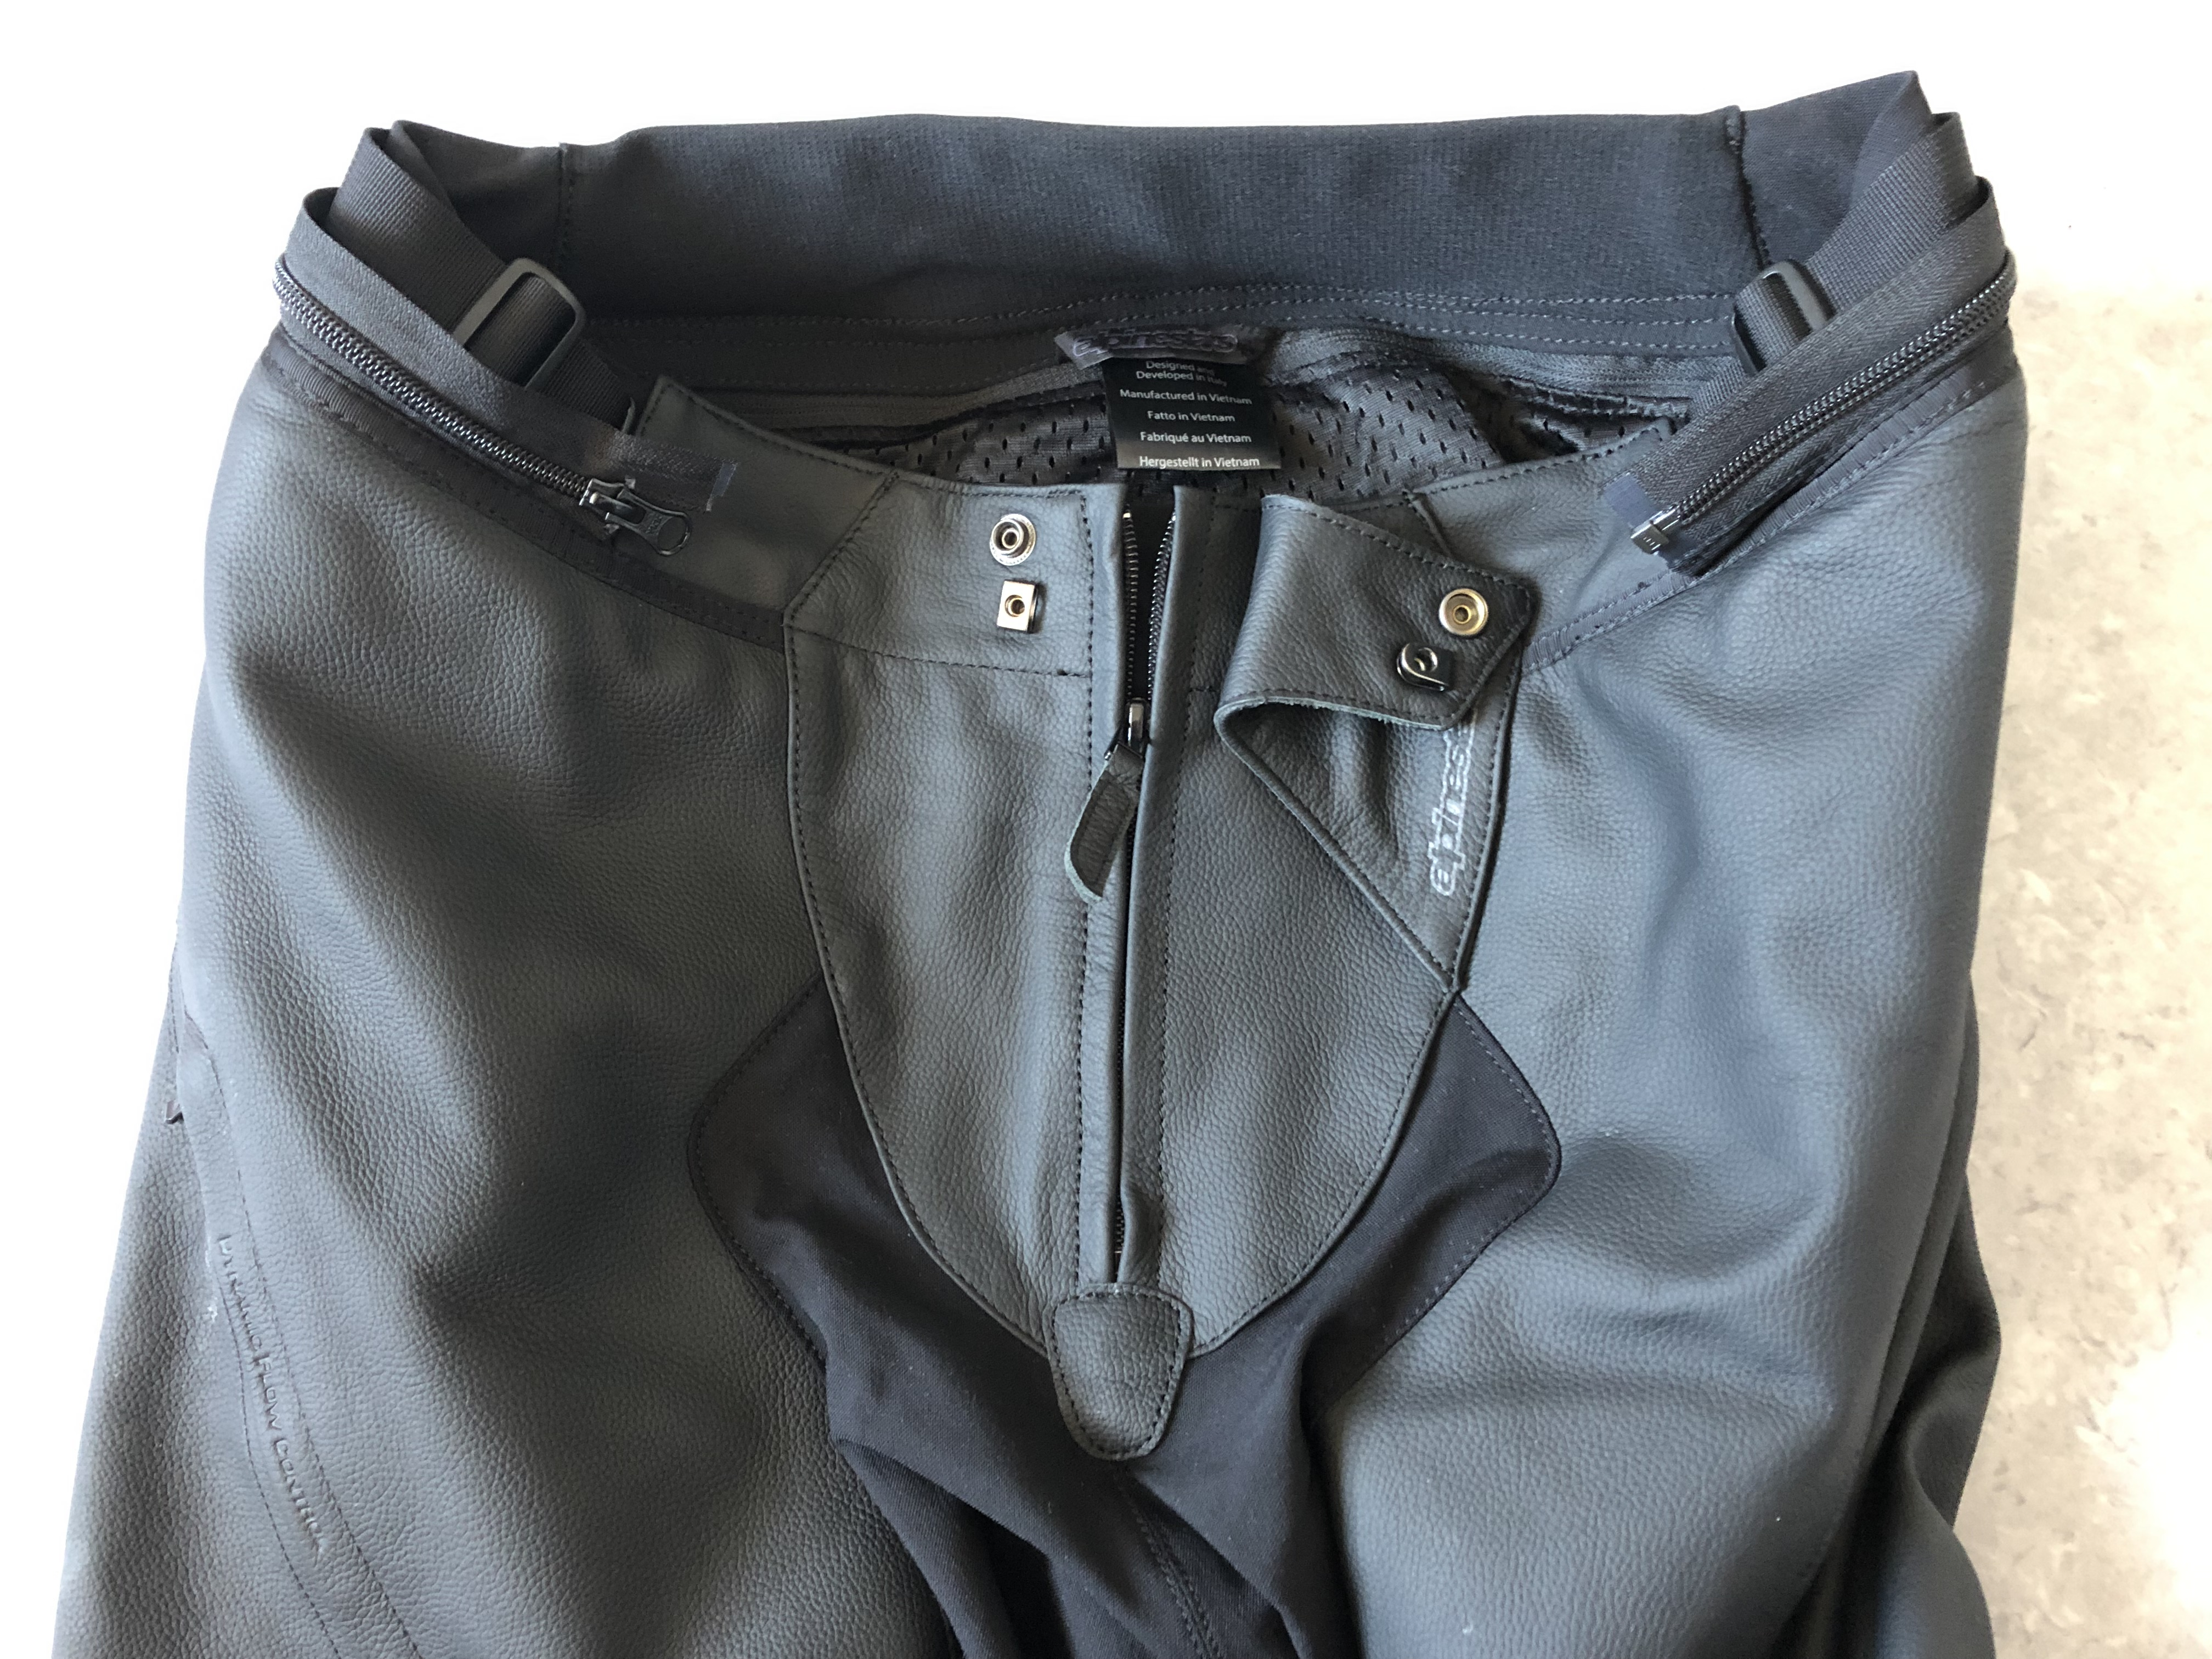 Système de fermeture du pantalon Alpinestars Missile V2